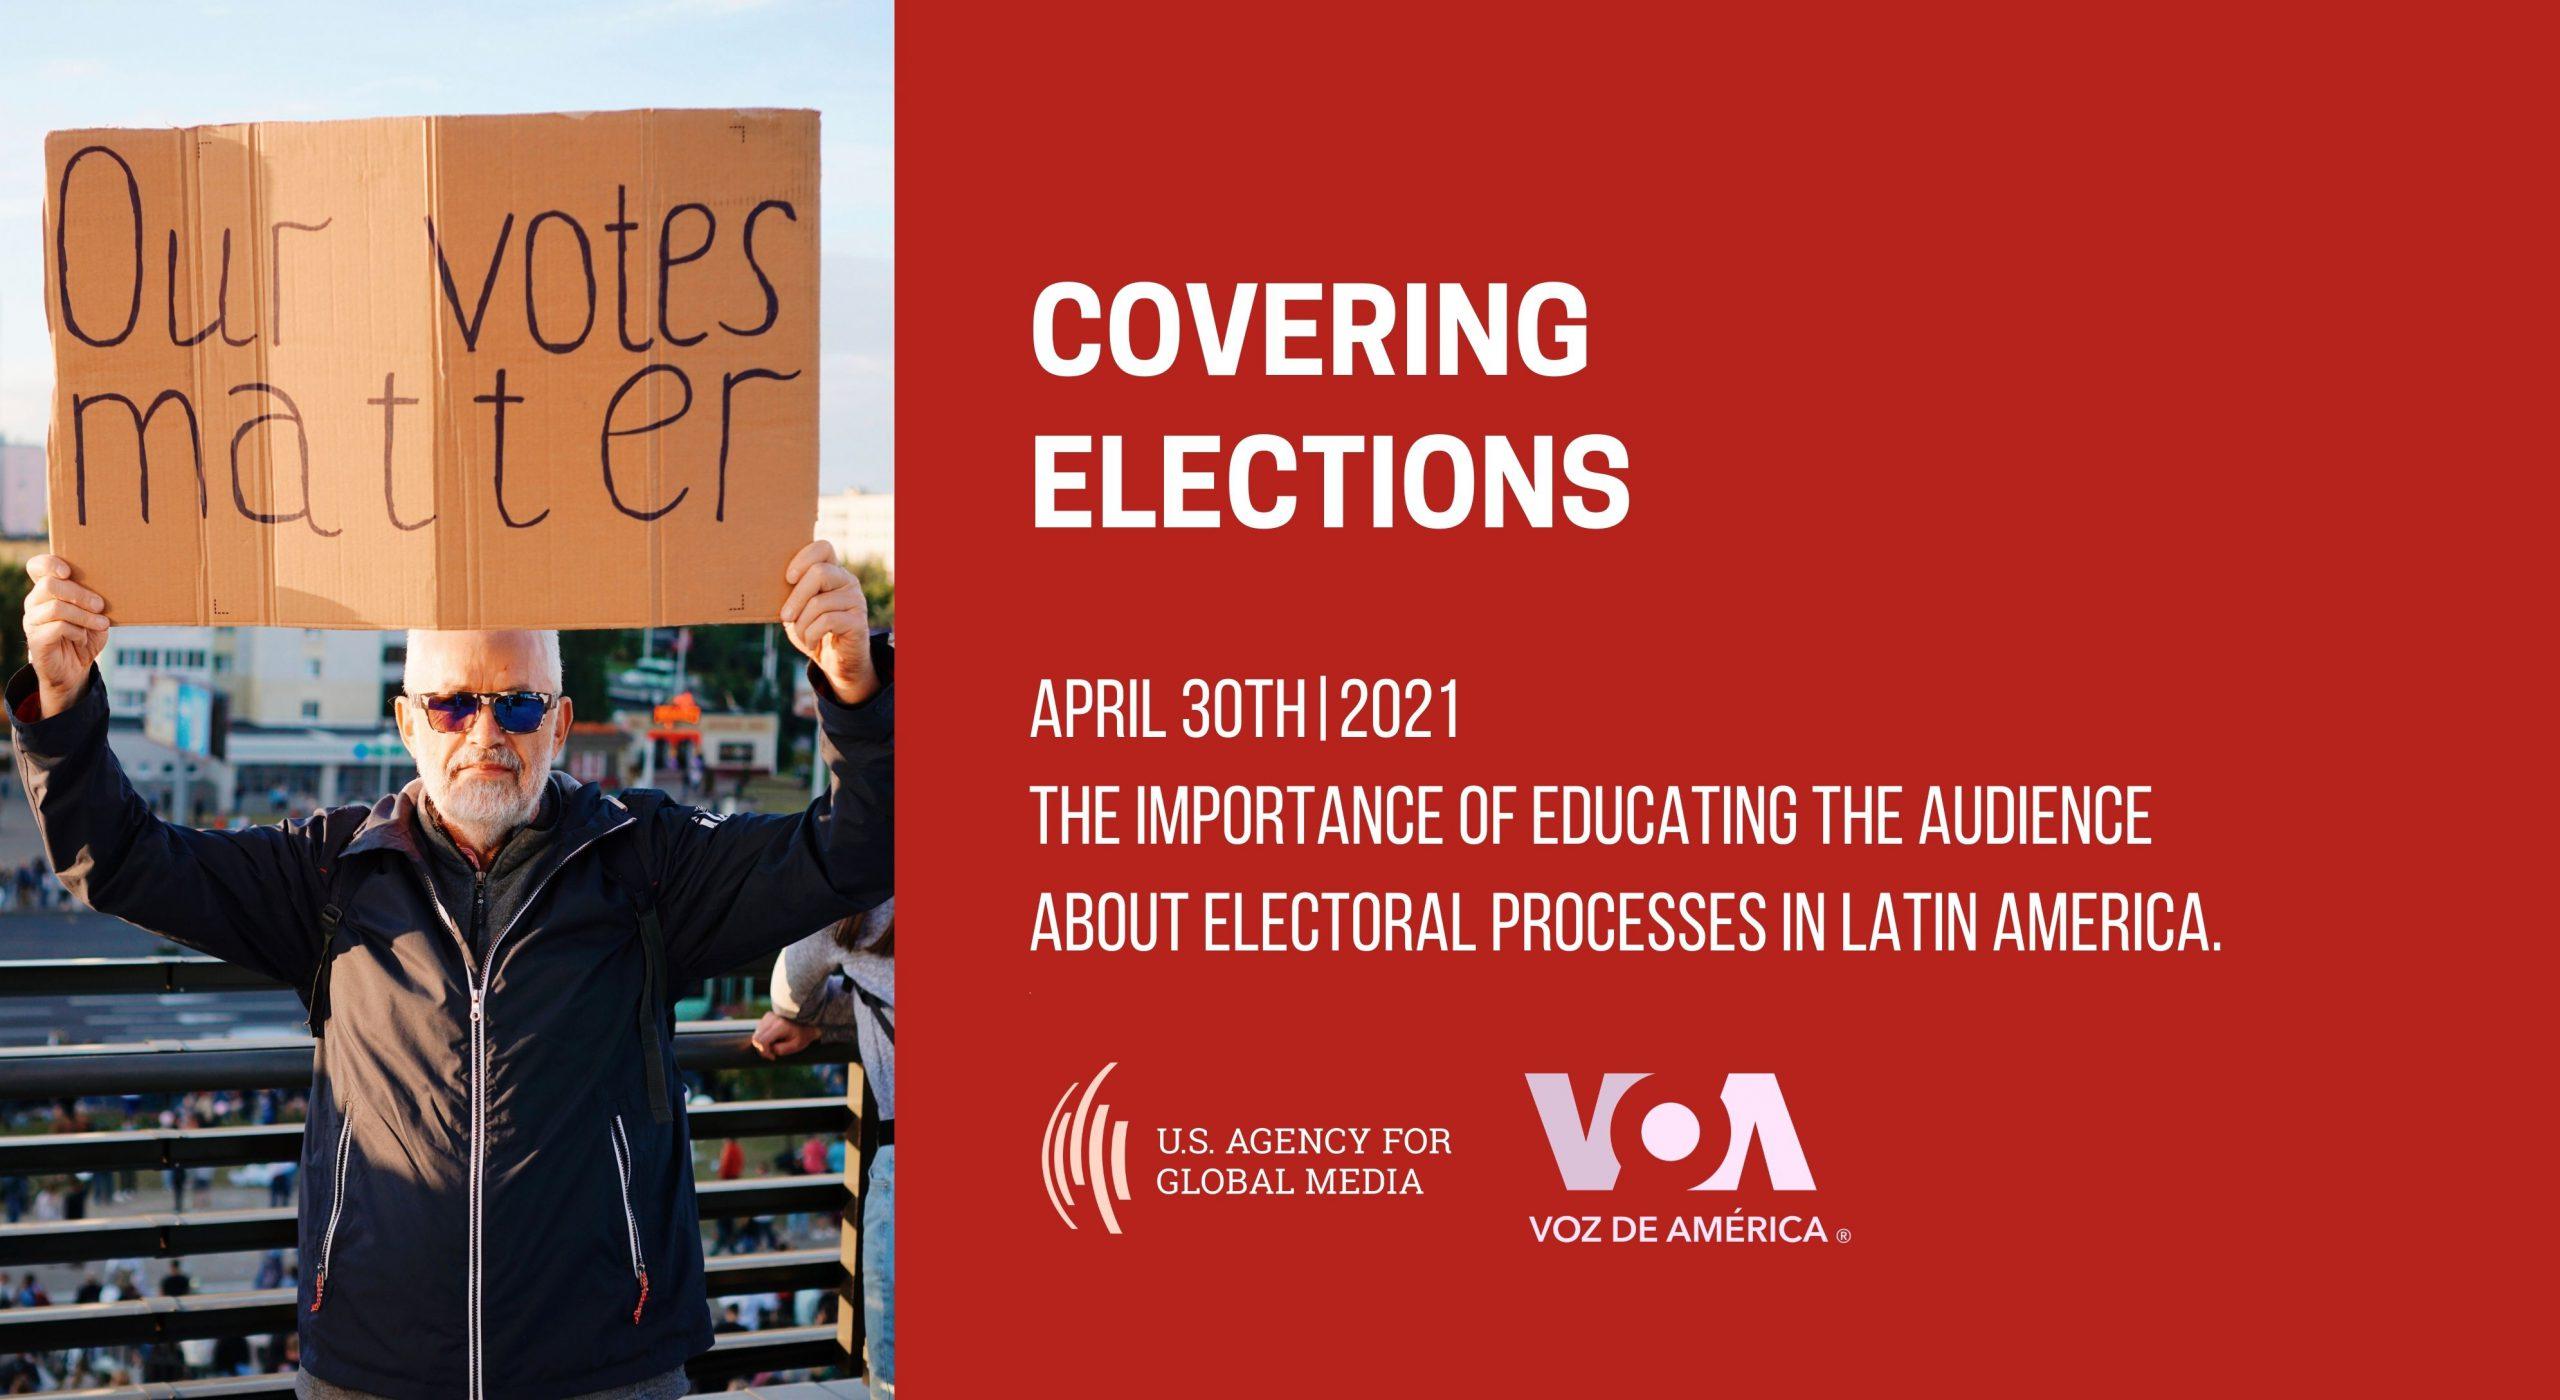 Latin America: Election Coverage